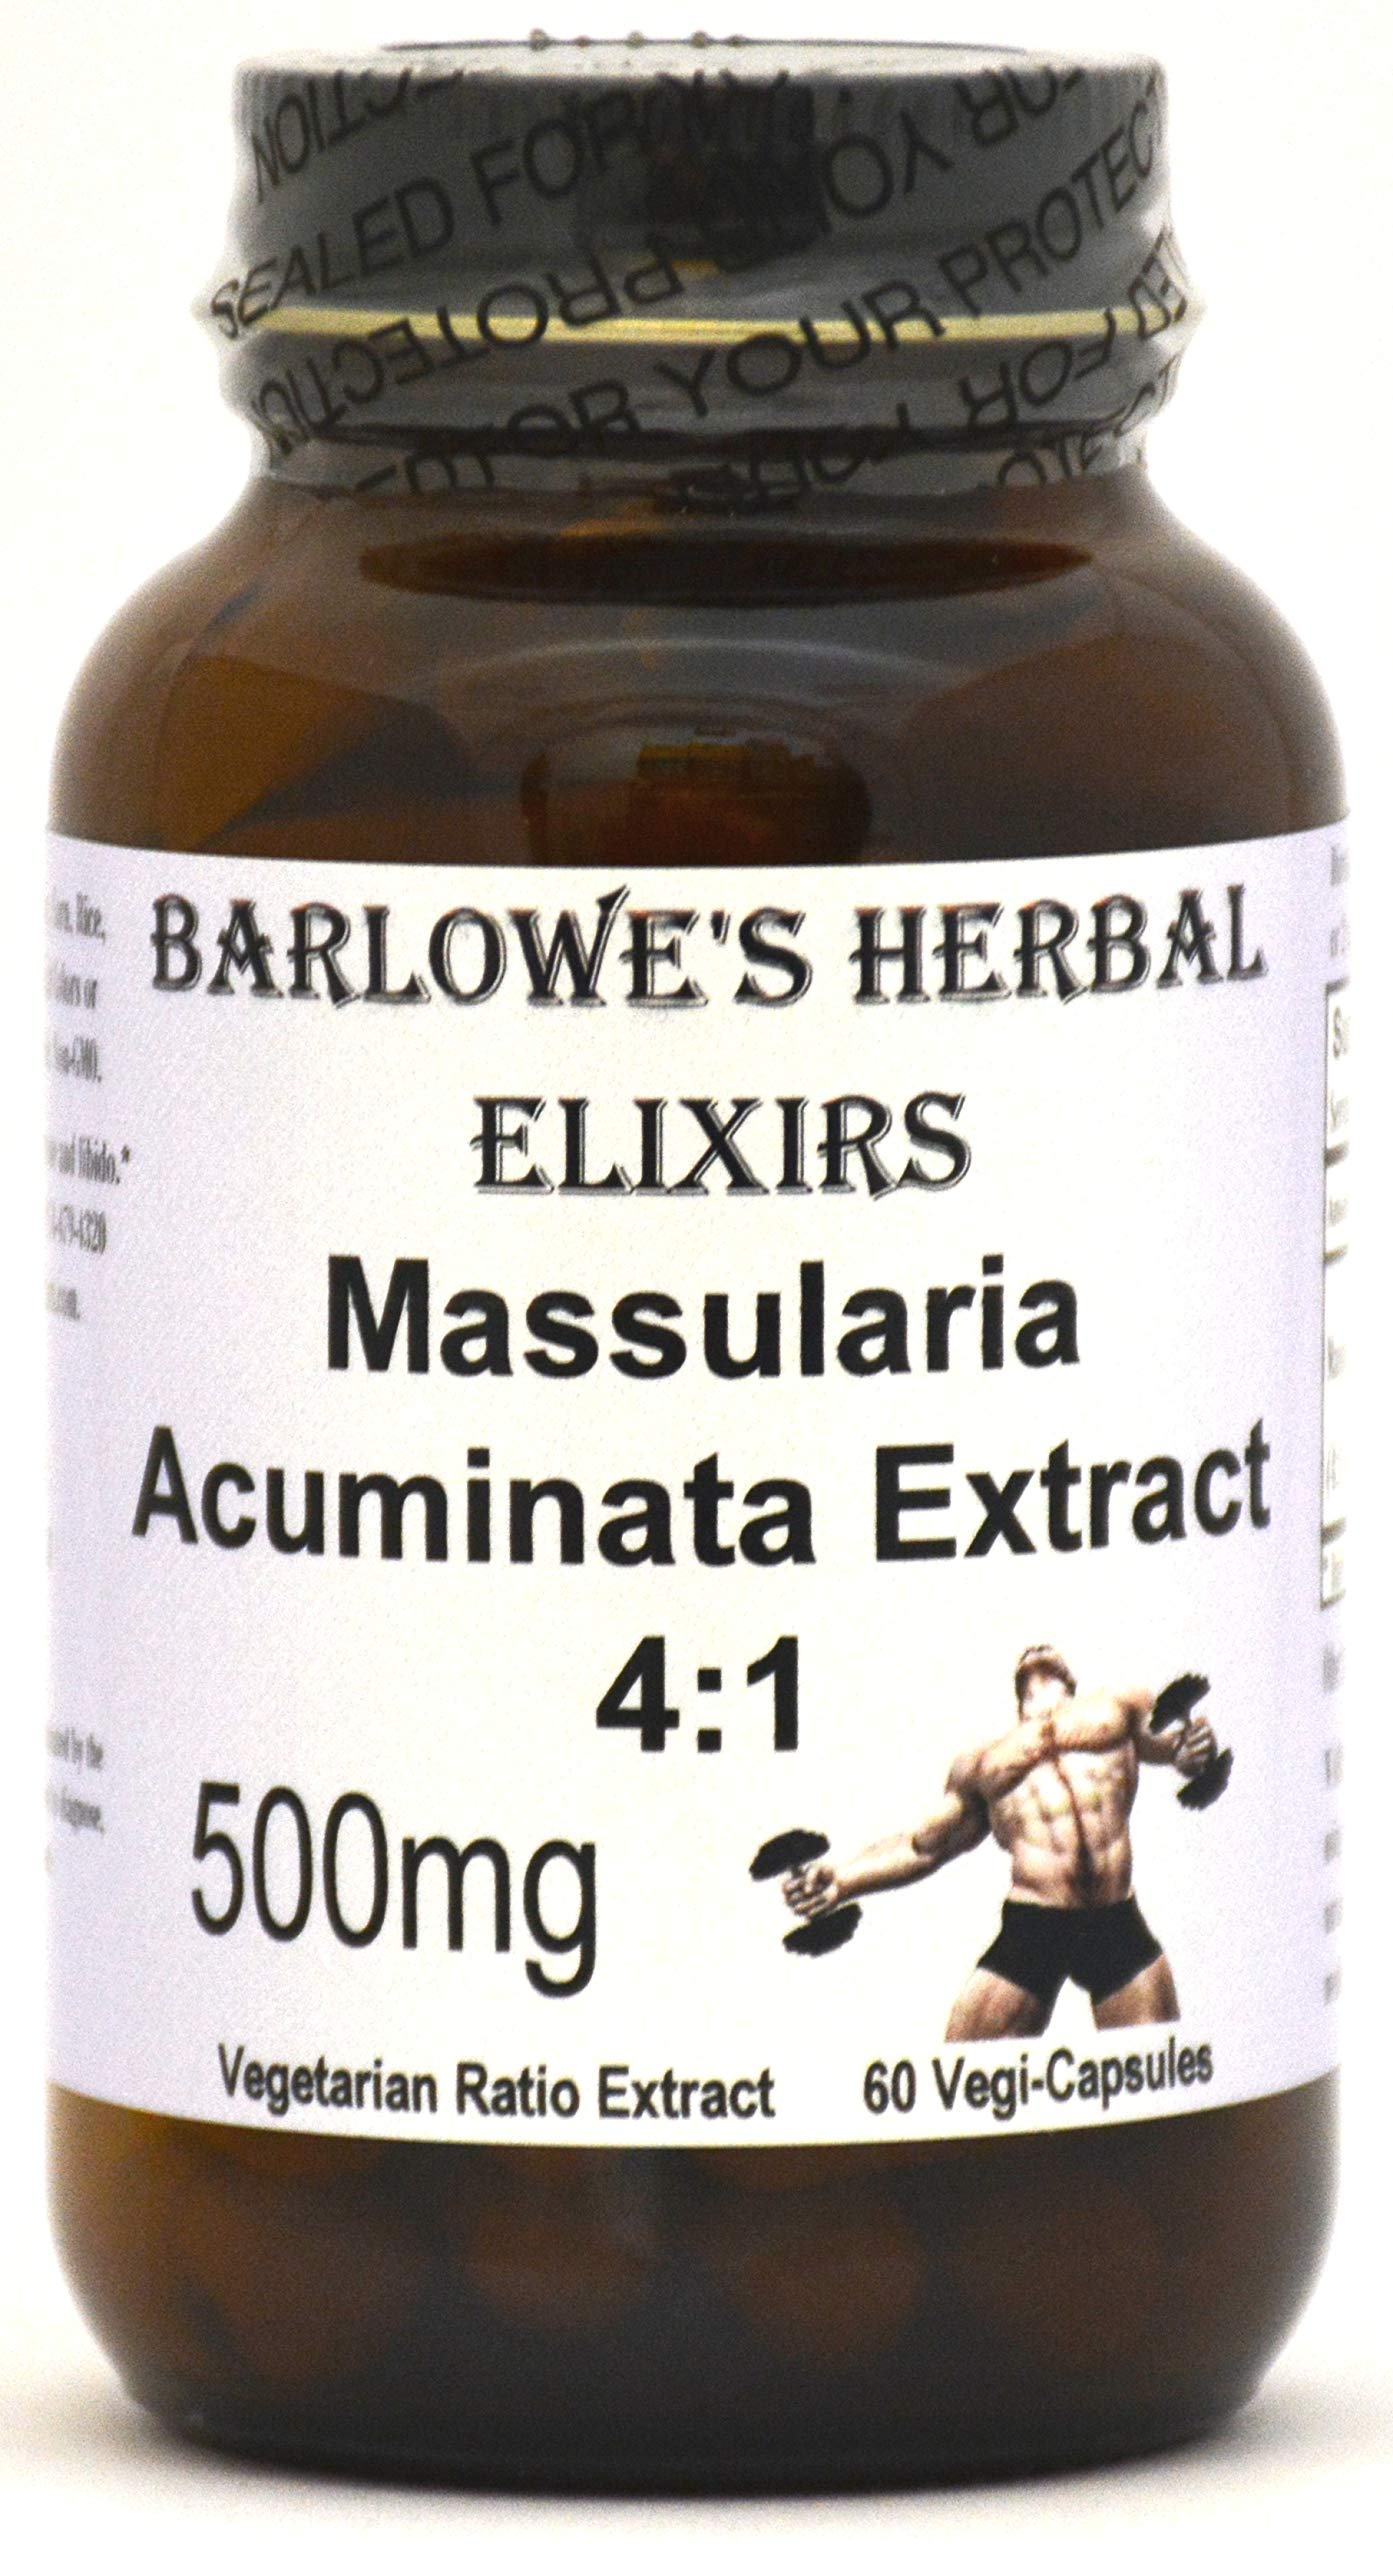 Massularia Acuminata Extract 4:1 - 60 500mg VegiCaps - Stearate Free, Bottled in Glass!